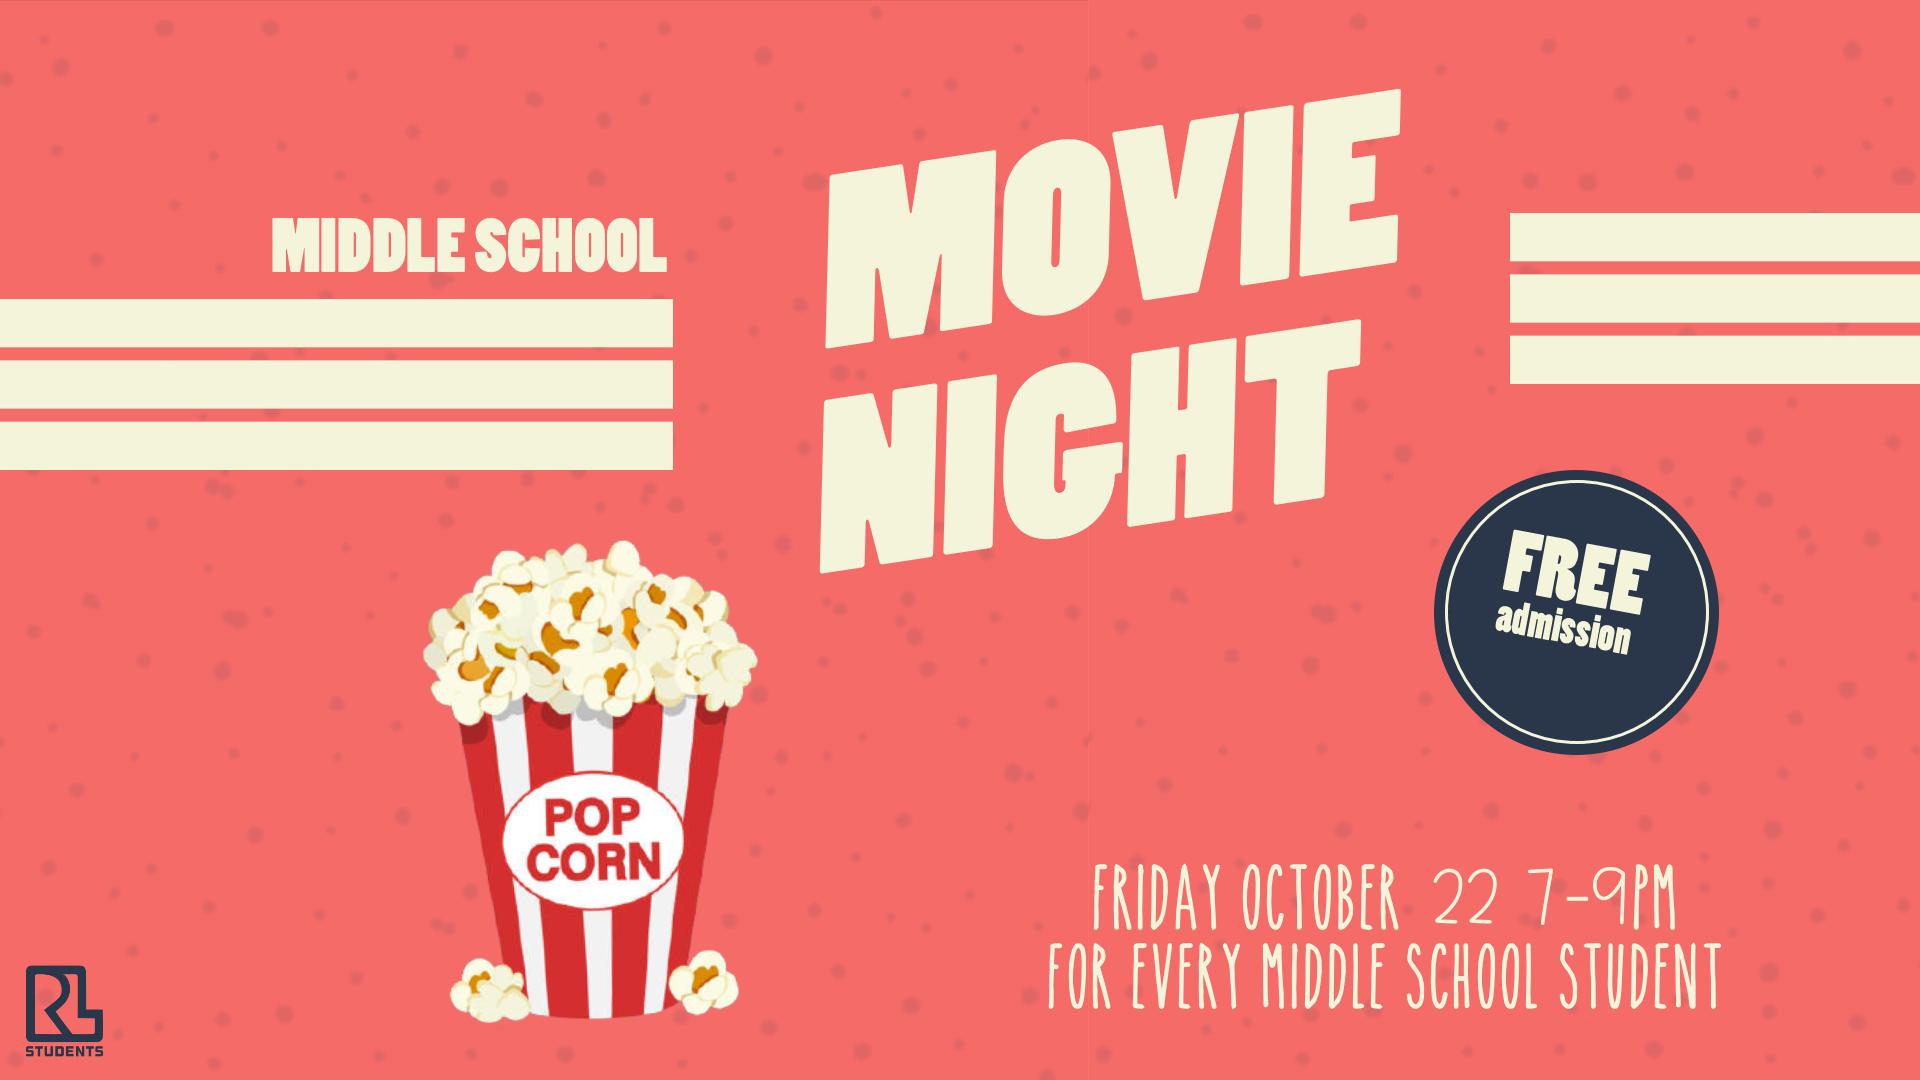 Middle School Movie Night